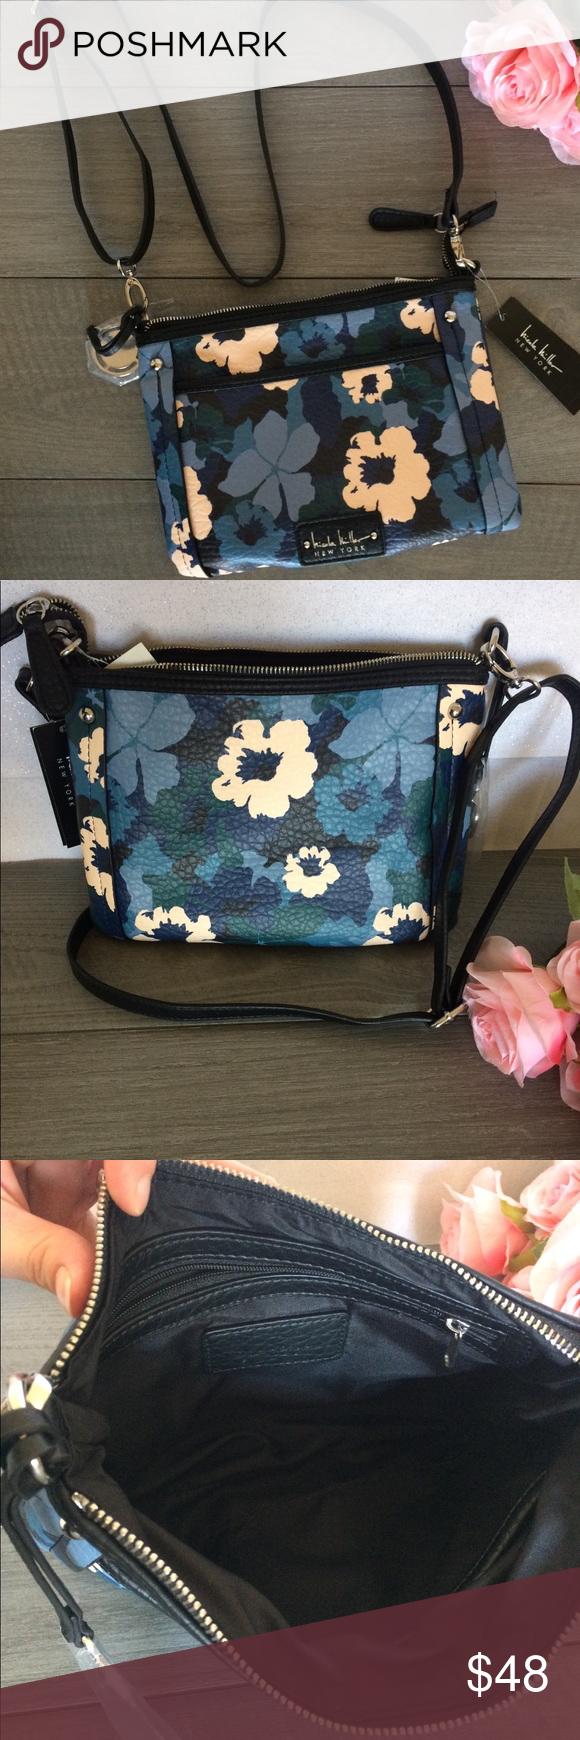 Brand New Nicole Miller Floral Crossbody Bags, Crossbody